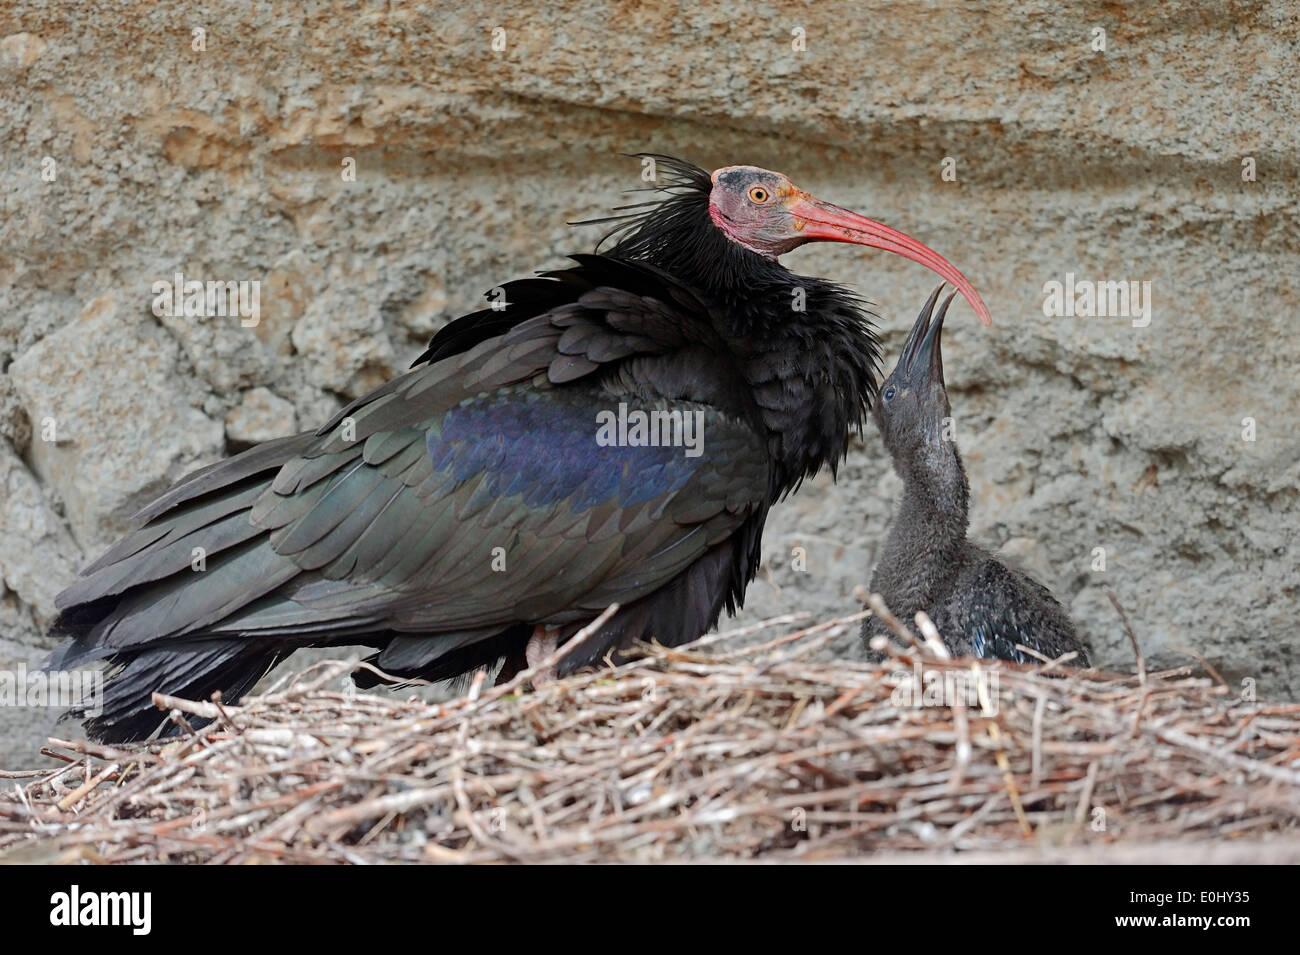 Northern Bald Ibis, Hermit Ibis or Waldrapp (Geronticus eremita) with chick at nest - Stock Image